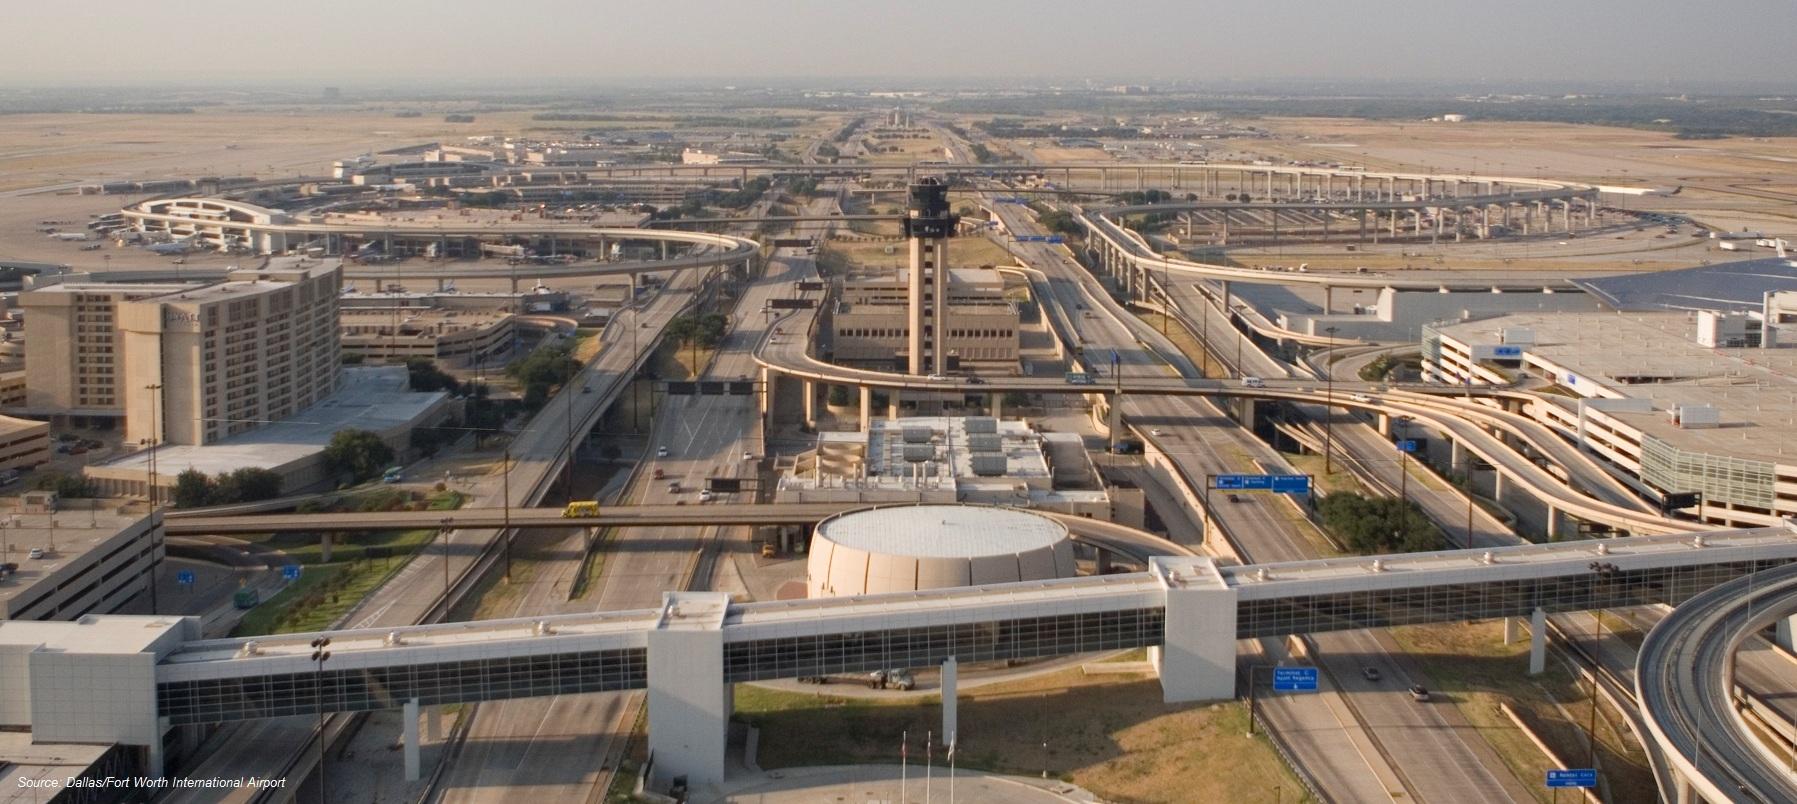 Dallas Fort-Worth International Airport